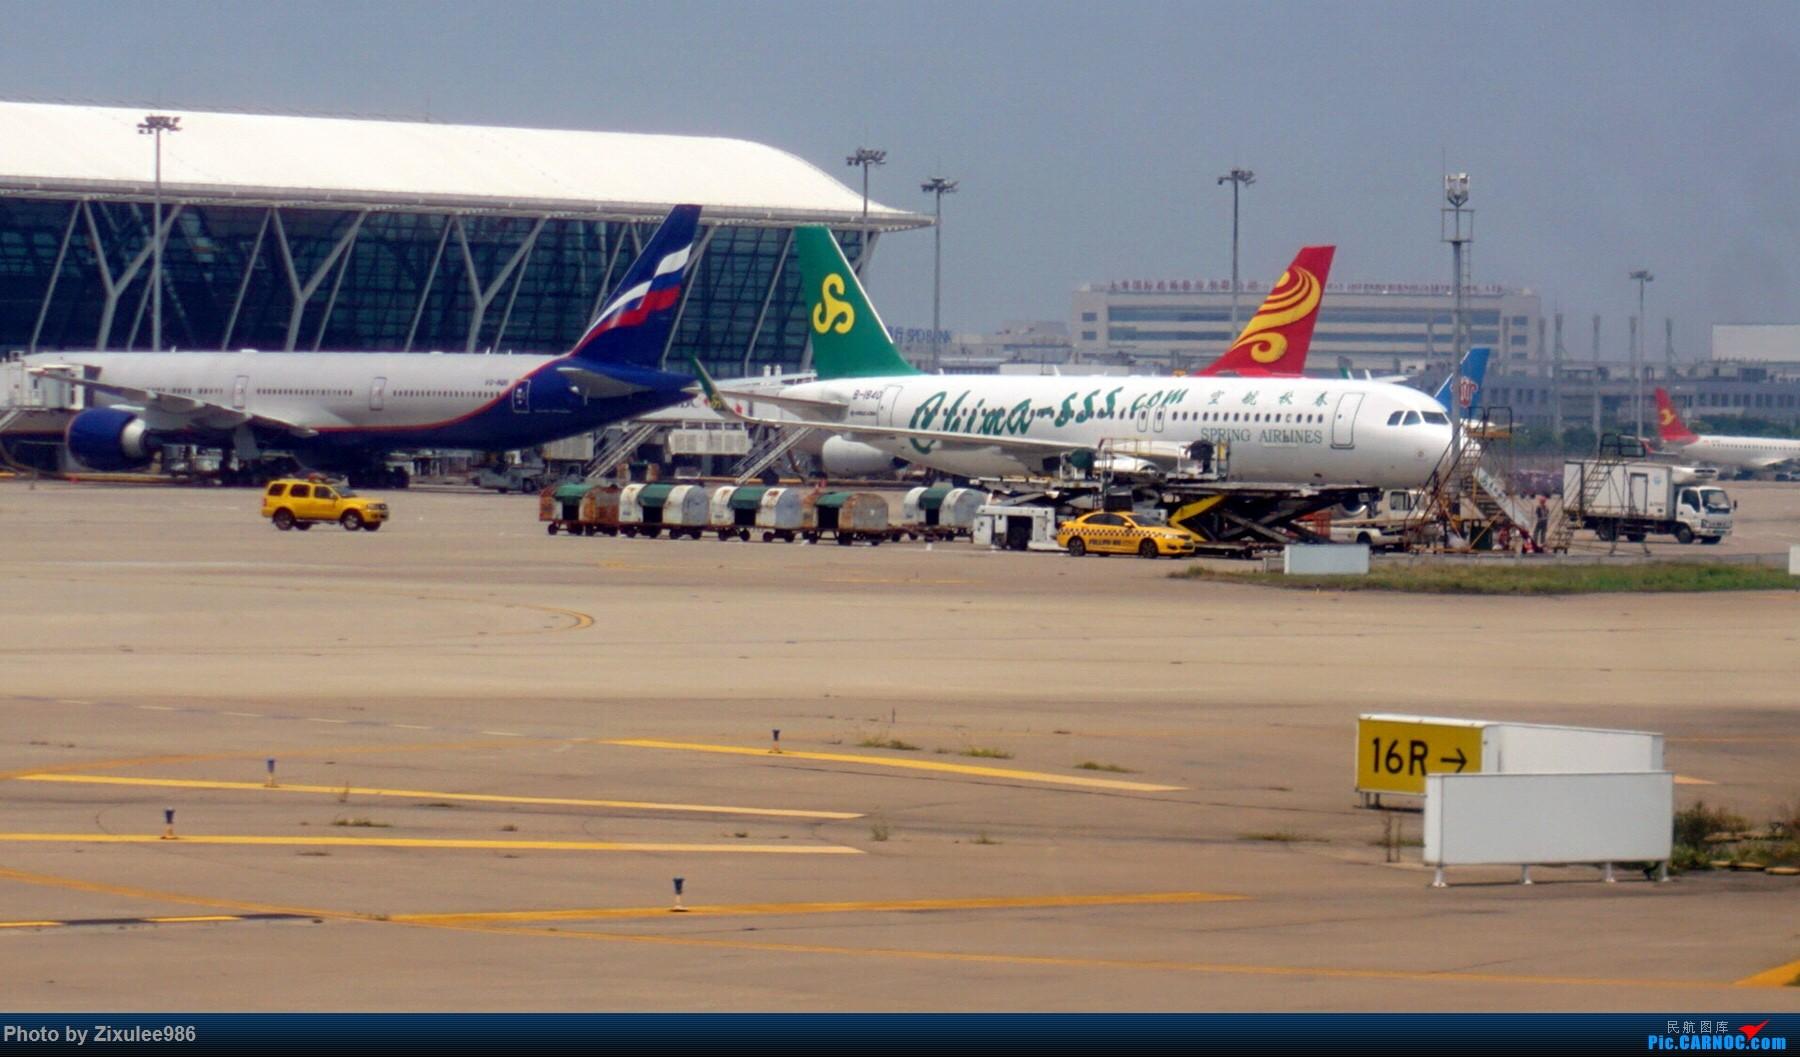 Re:[原创]加拿大21日游学之旅(一)~JJN-PVG-YYZ..(内含flightlog)~第一次发游记~多图缓更请谅解 AIRBUS A320-200 B-1840 中国上海浦东国际机场